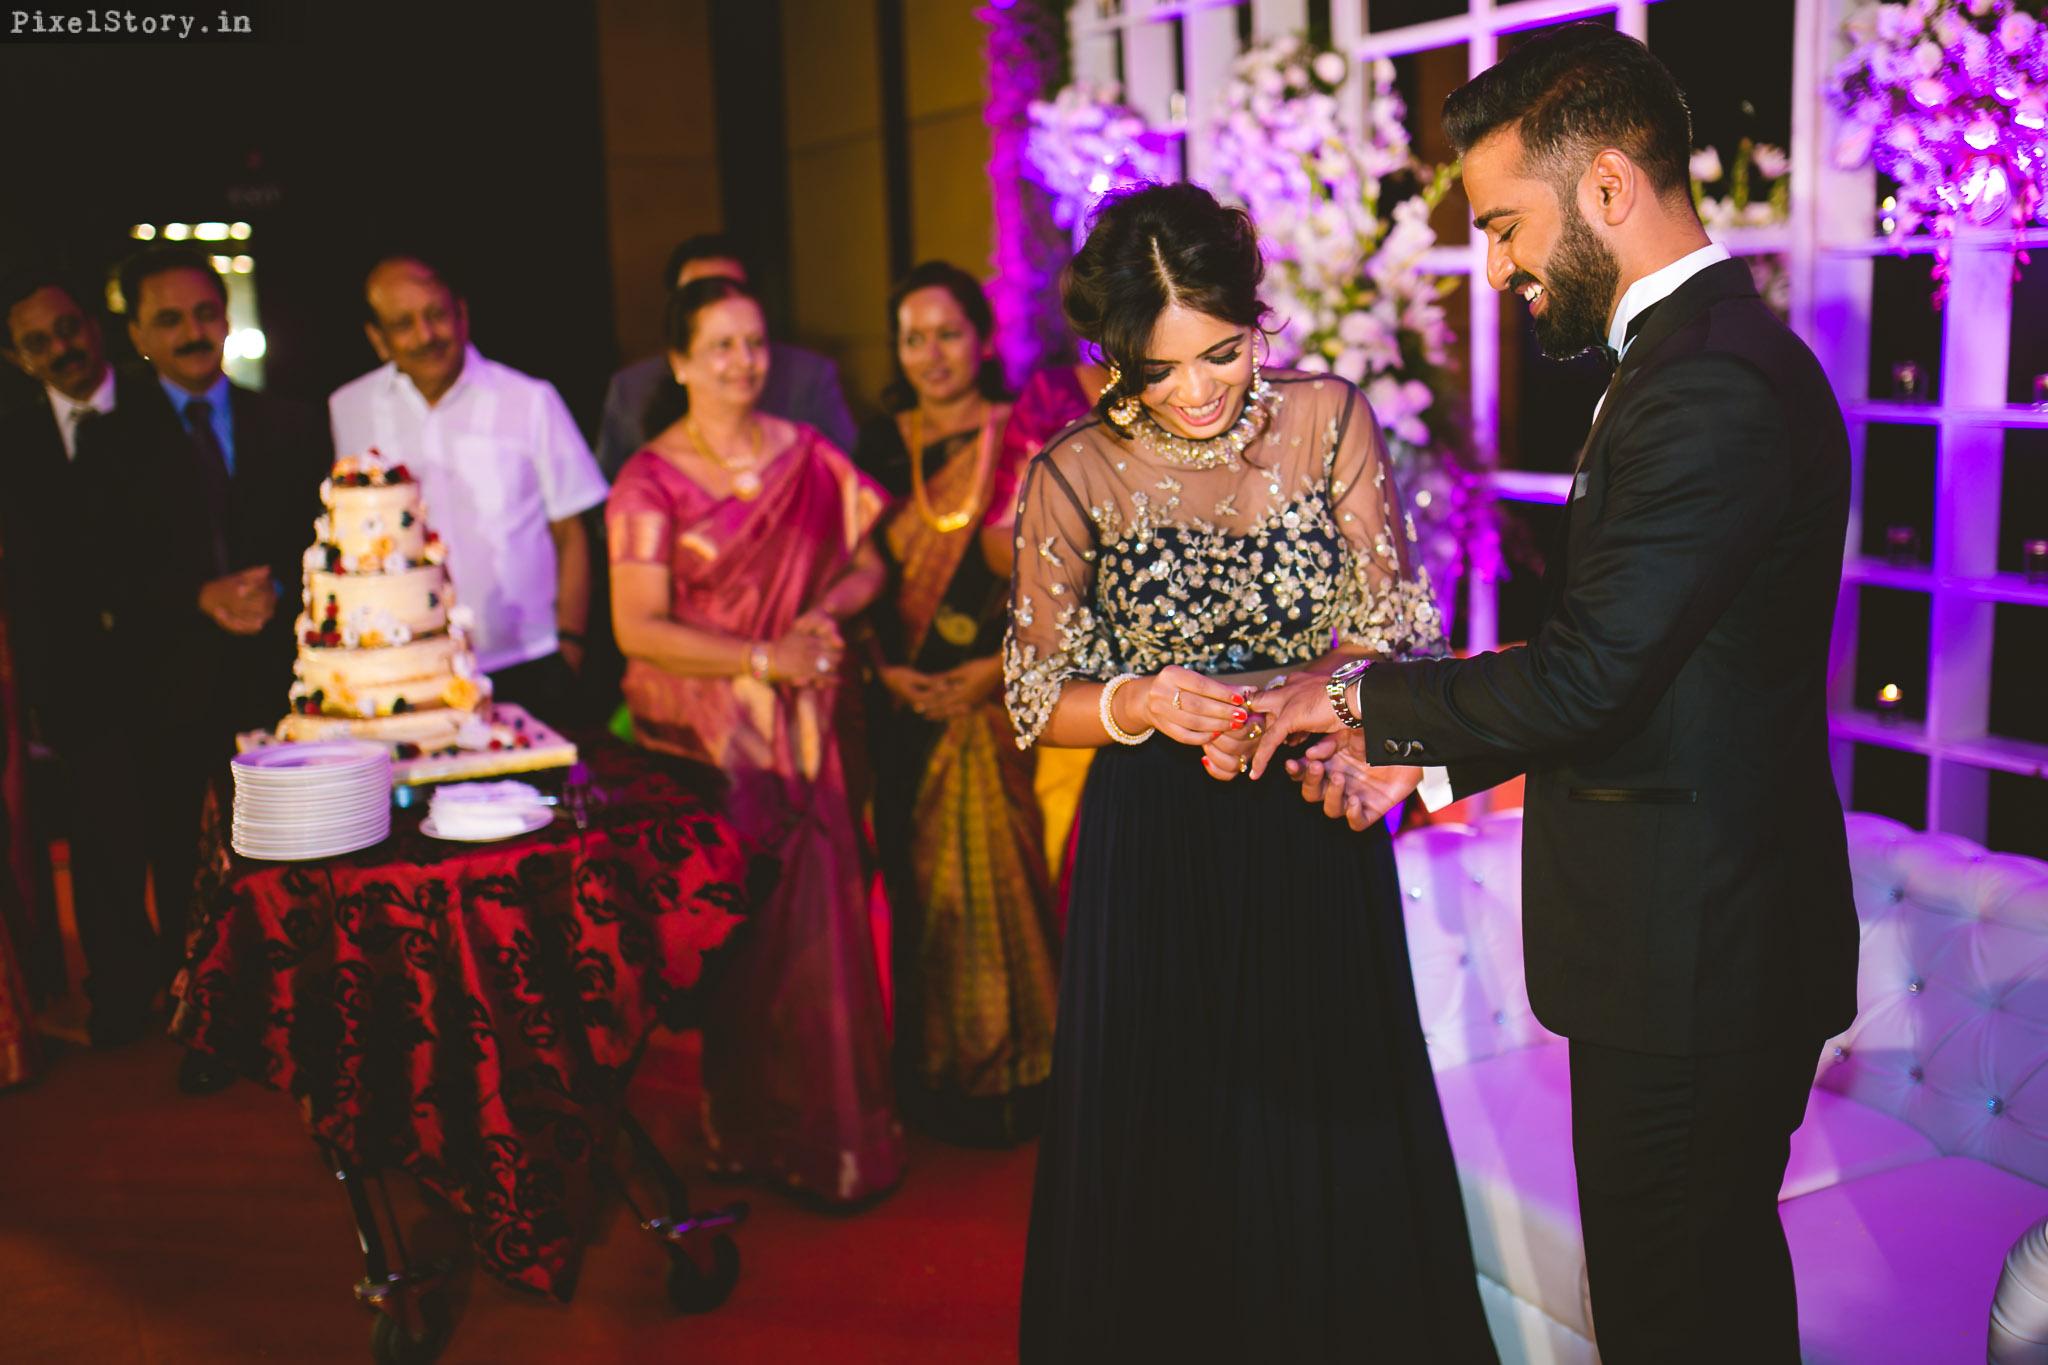 PixelStory-Engagement-Ritz-Carlton-Preksha-Bharath-013.jpg